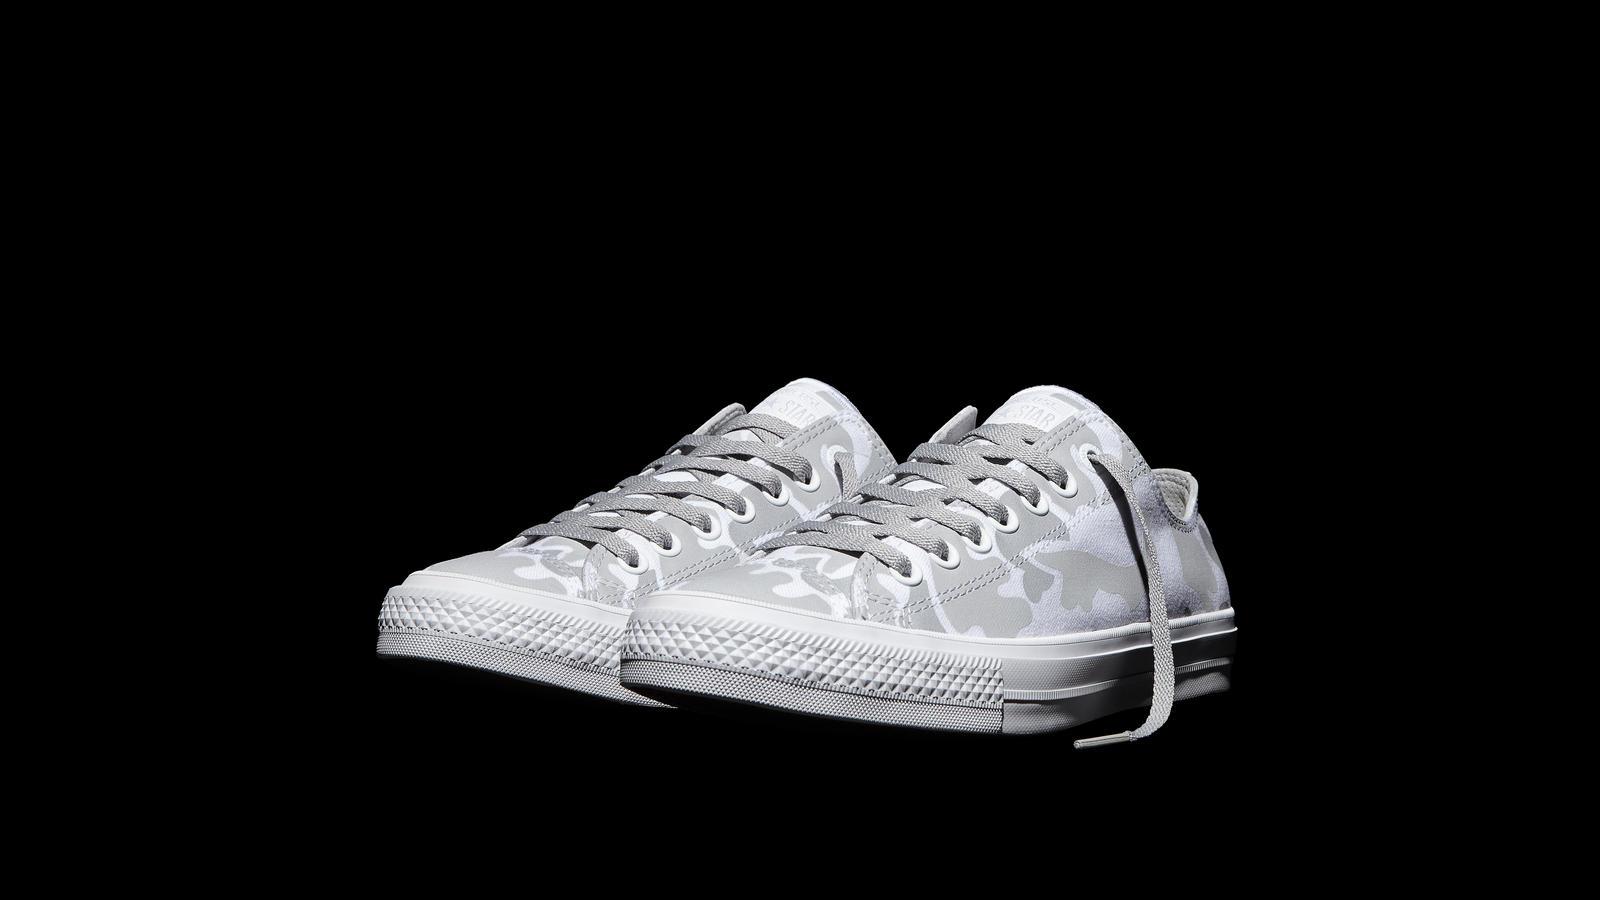 50e75bf4fe531c Converse Chuck Taylor All Star Ii Reflective Camo White Pair Original